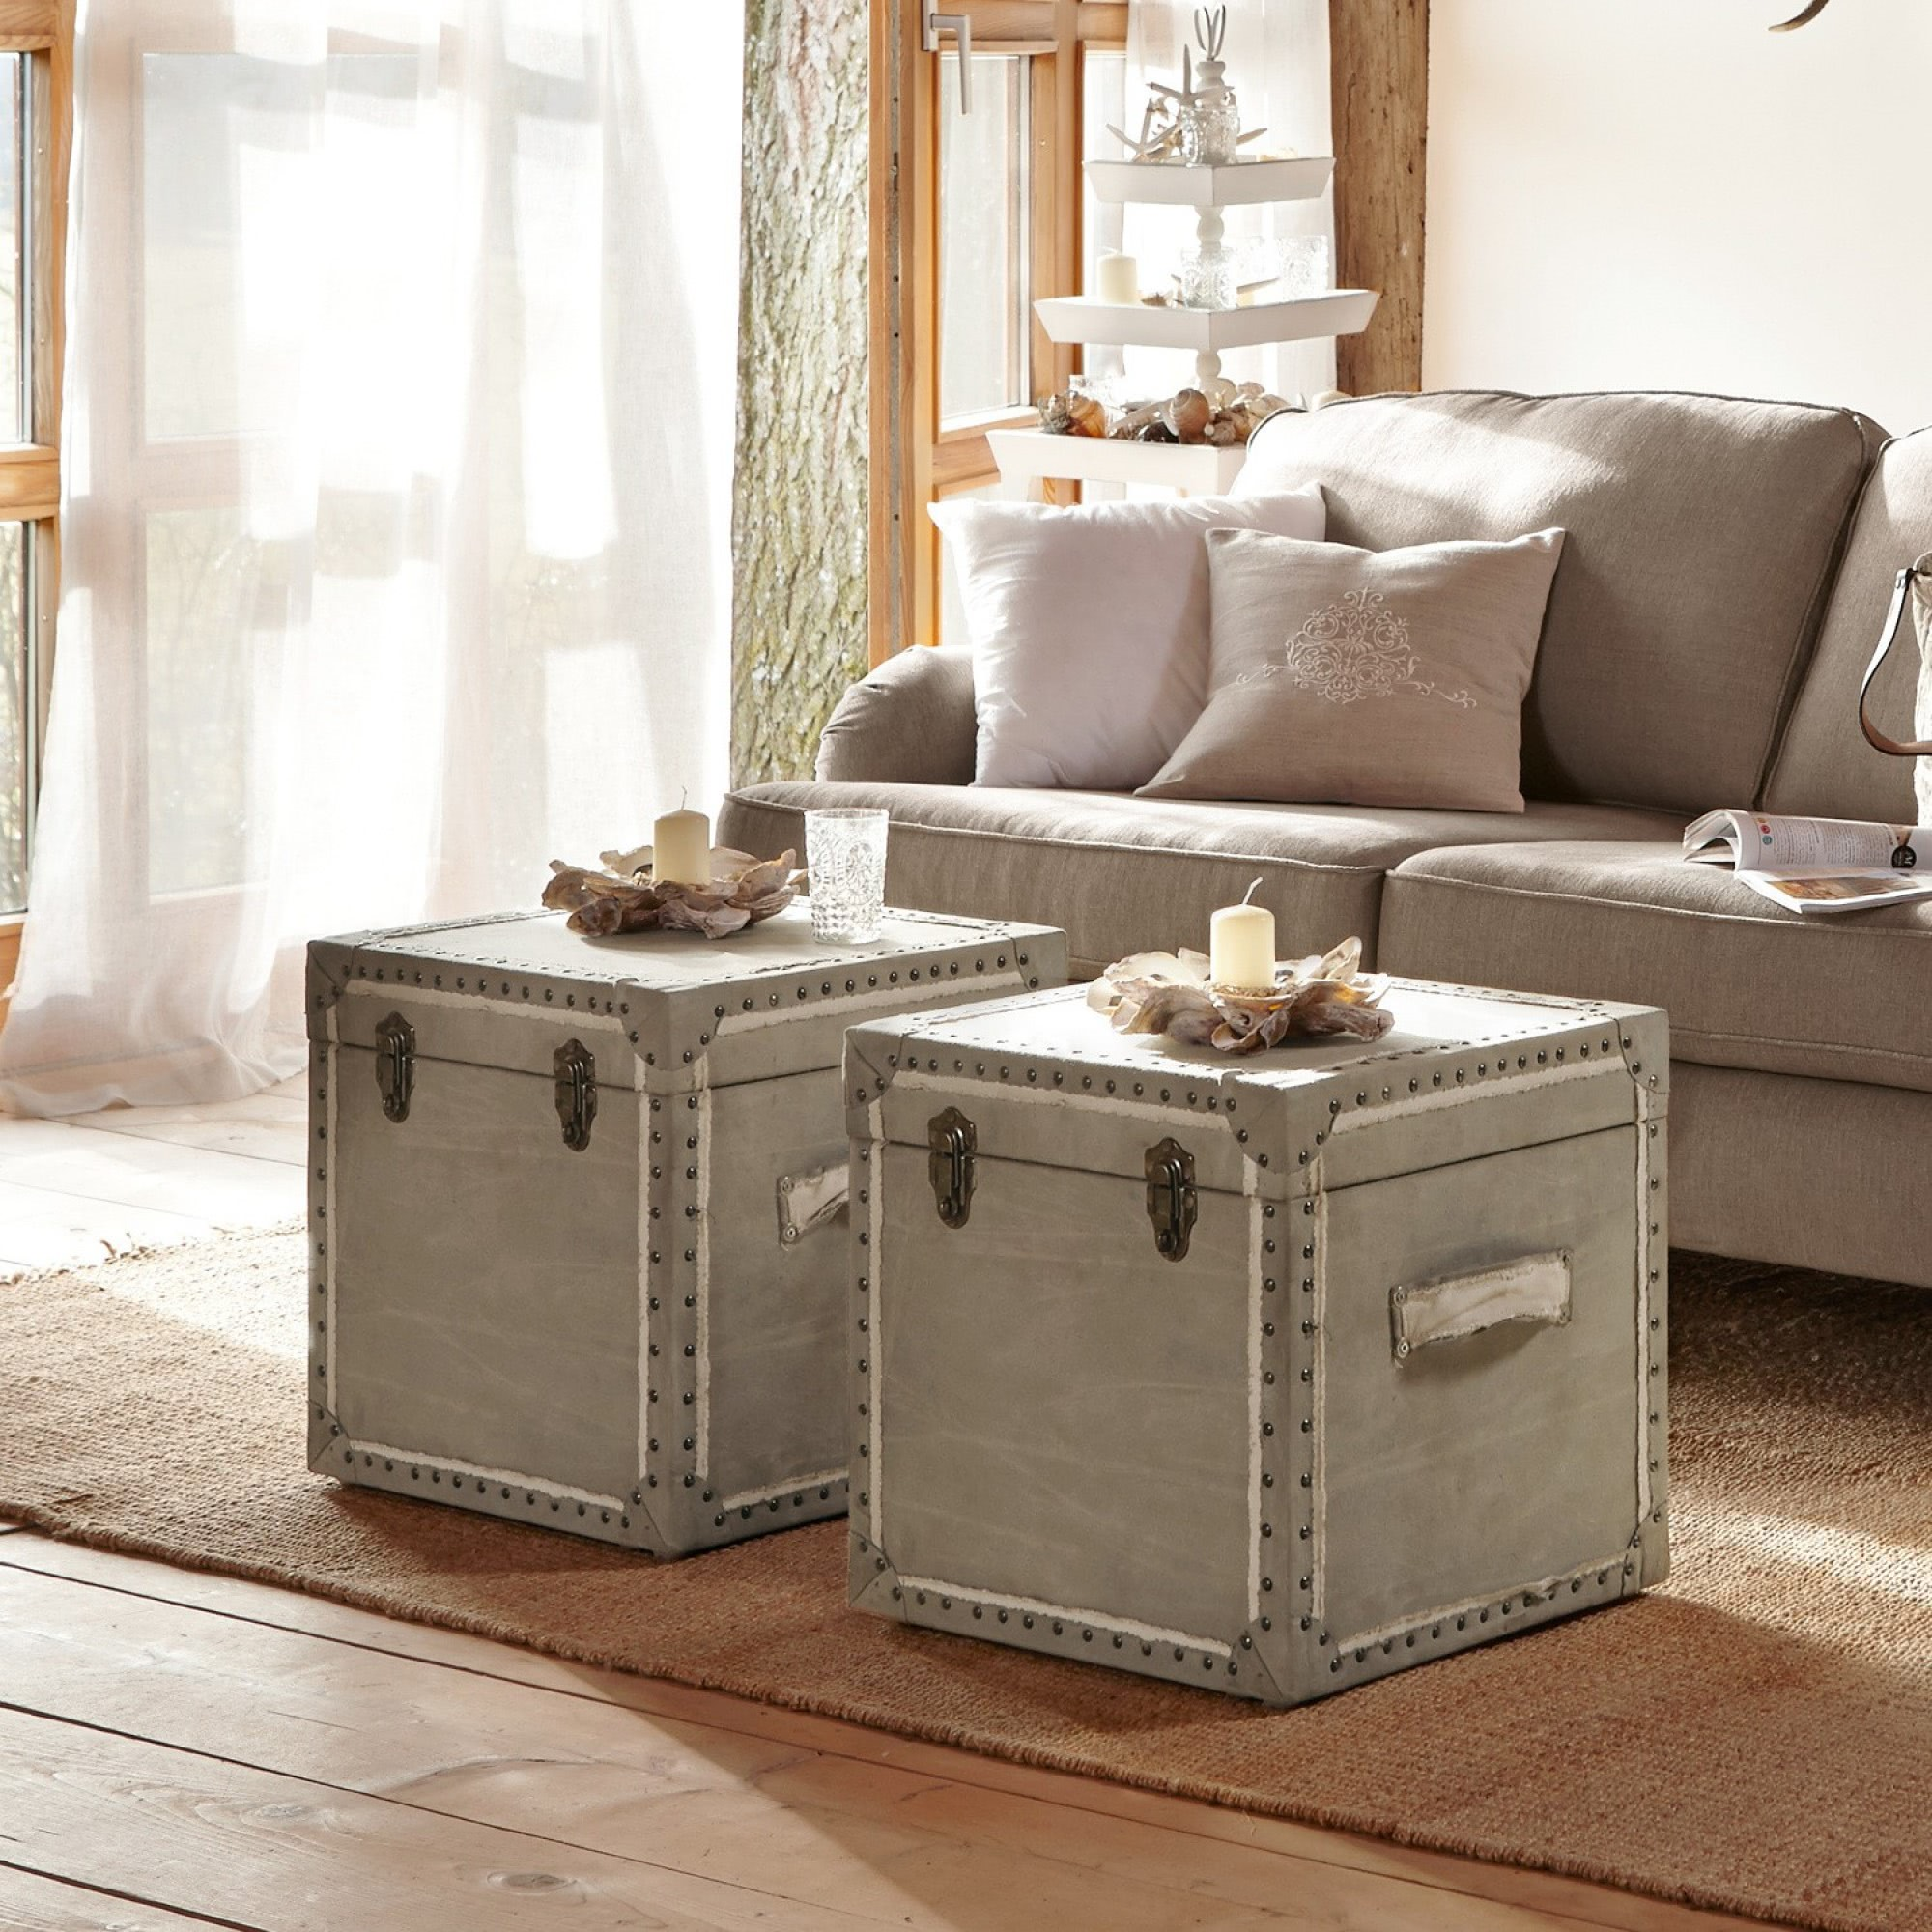 truhe felin loberon coming home. Black Bedroom Furniture Sets. Home Design Ideas